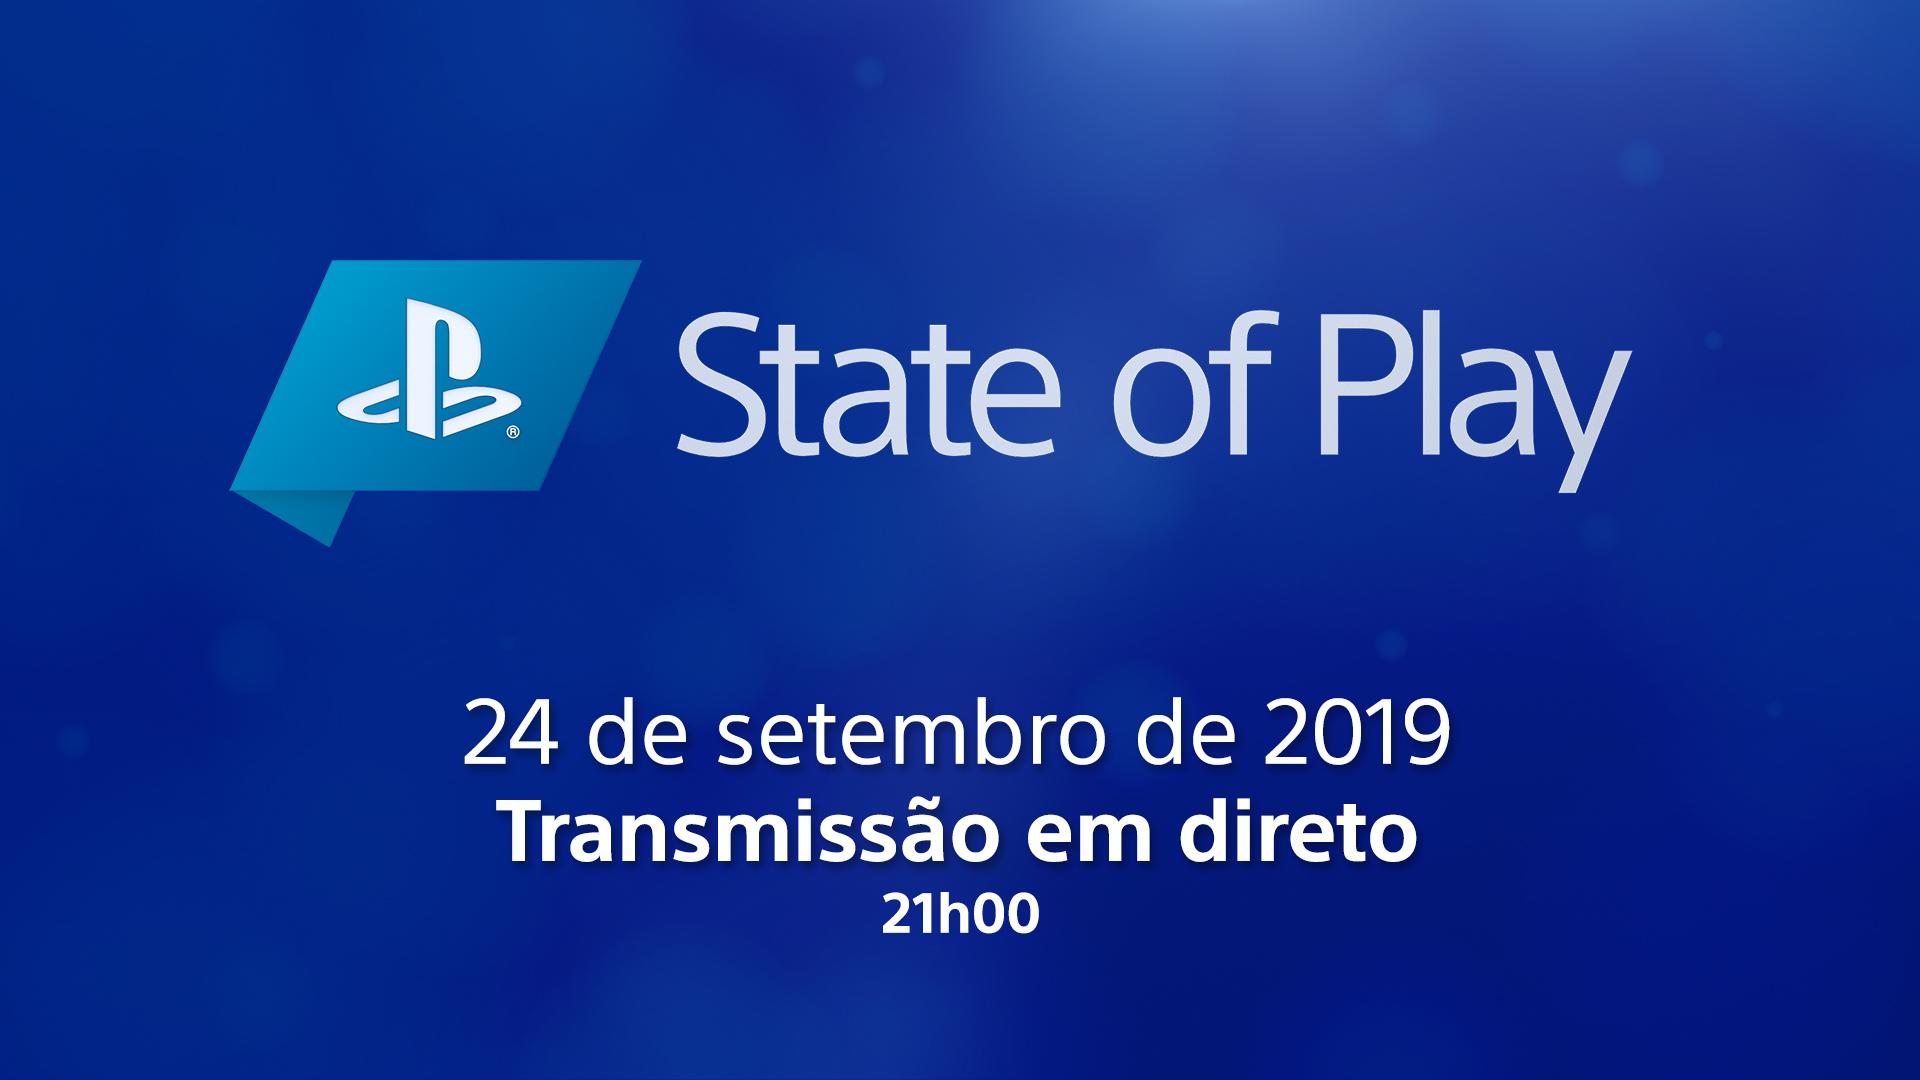 Novo State of Play na próxima semana